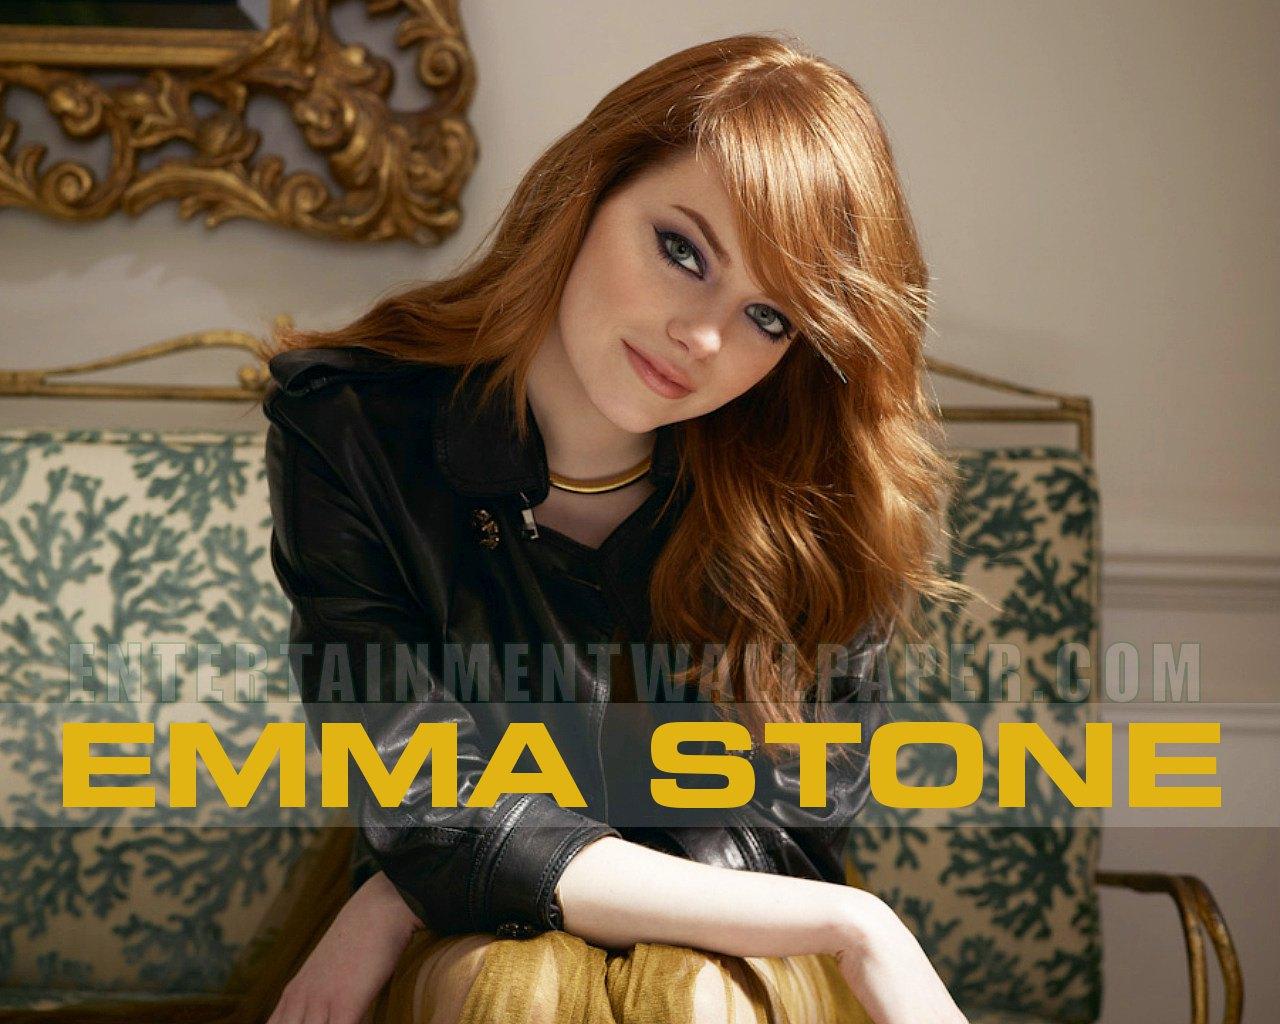 Emma Stone - Emma Stone Wallpaper (34510226) - Fanpop Emma Stone Movies